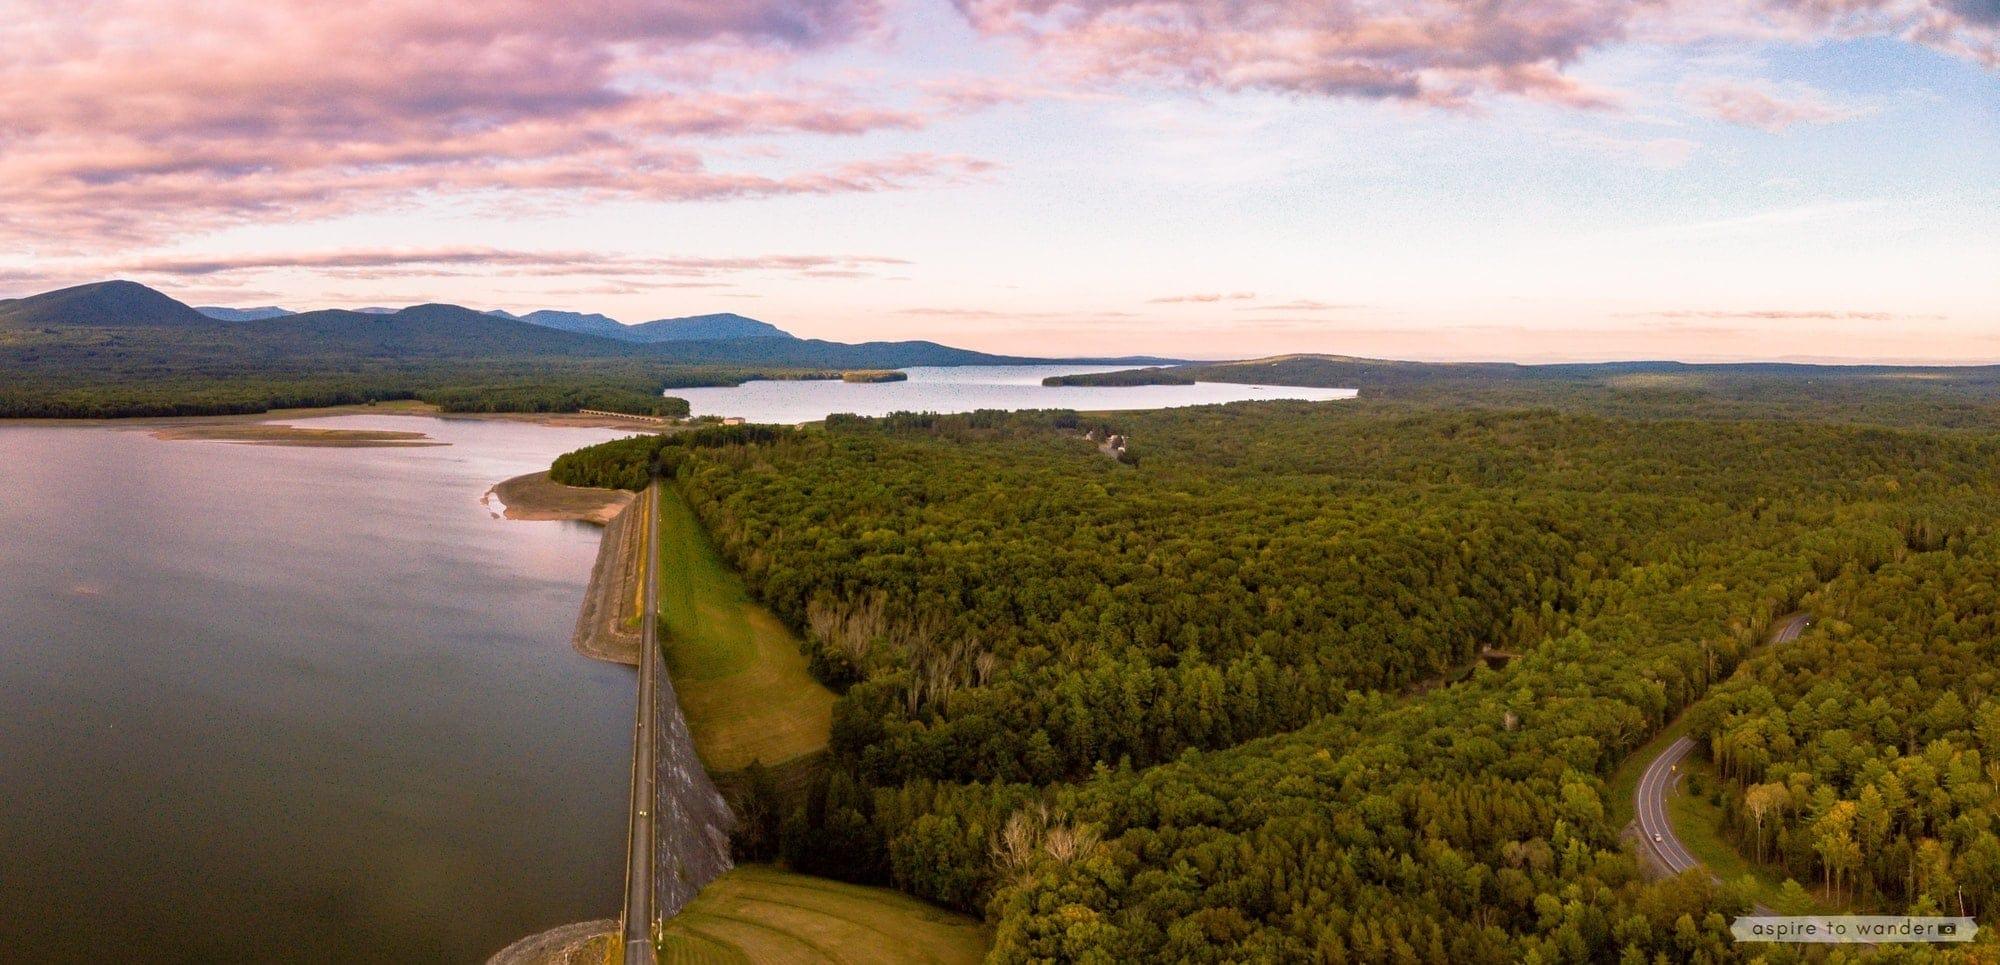 Ashokan Reservoir | Ulster County | Upstate New York